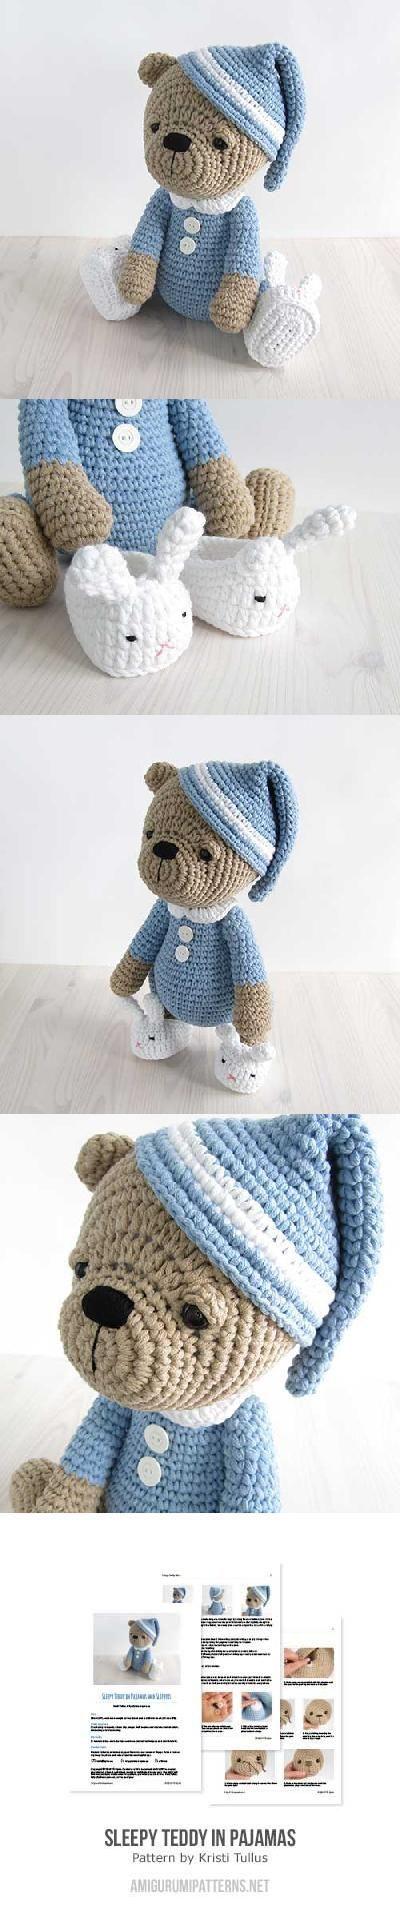 Sleepy teddy in pajamas: